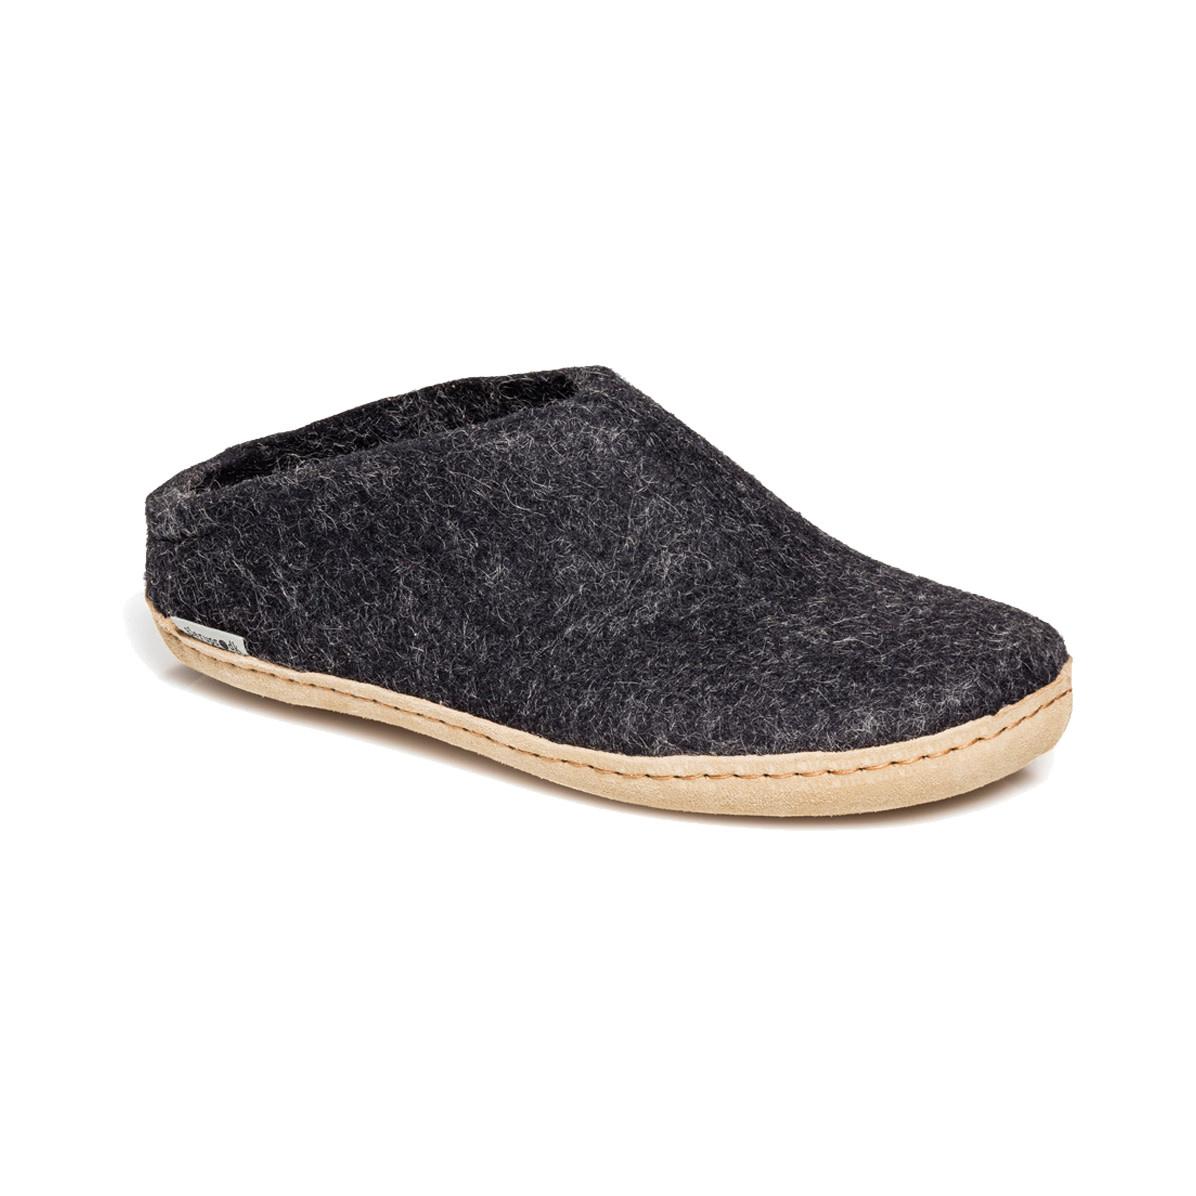 Glerups Glerups Men's Slipper Leather Sole Charcoal